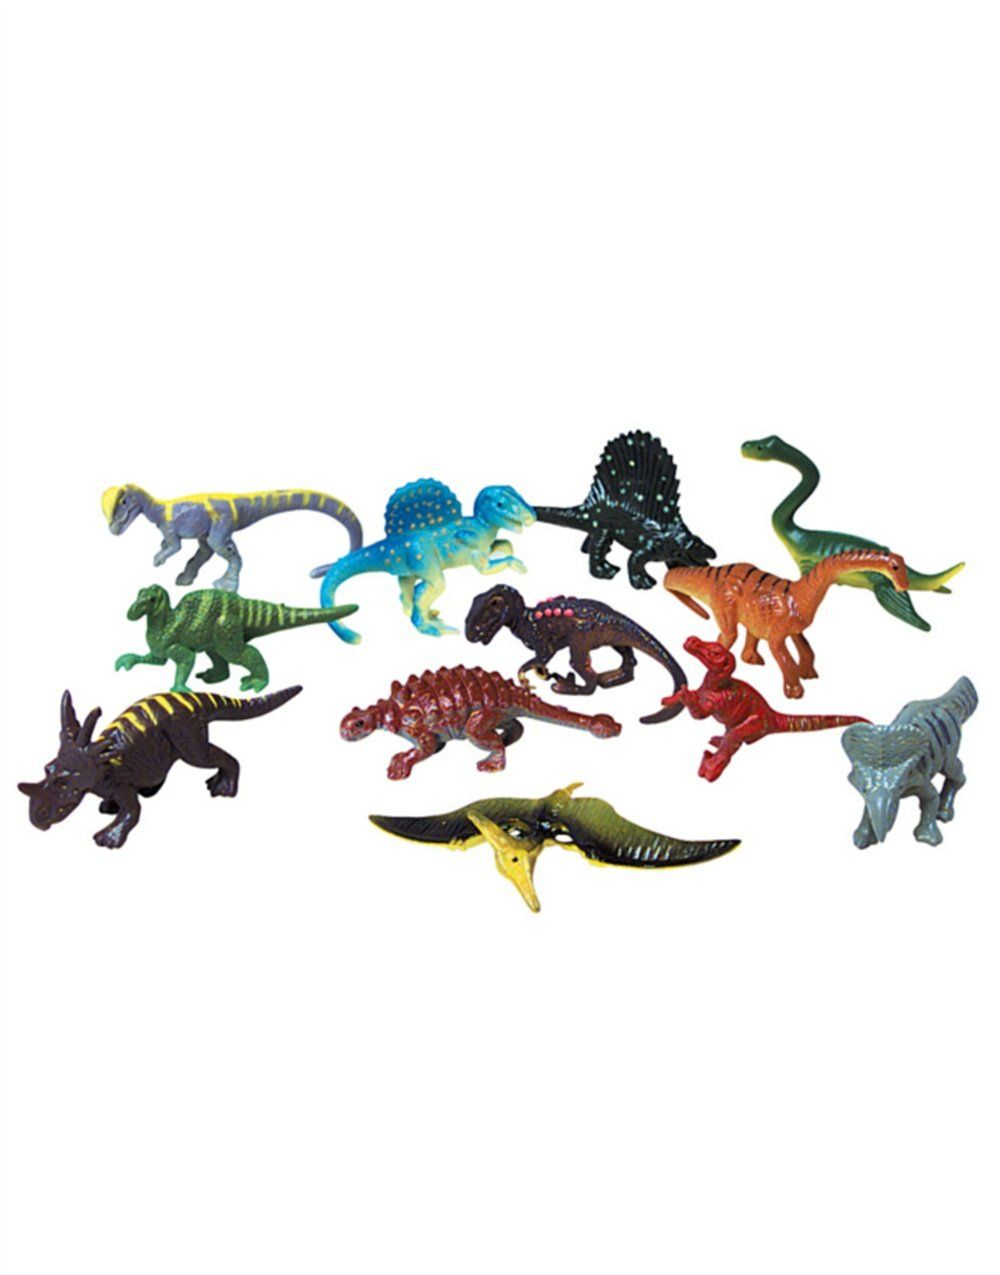 2.5 inch Plastic Toy Dino Figures New Dozen Small Toy Dinosaurs